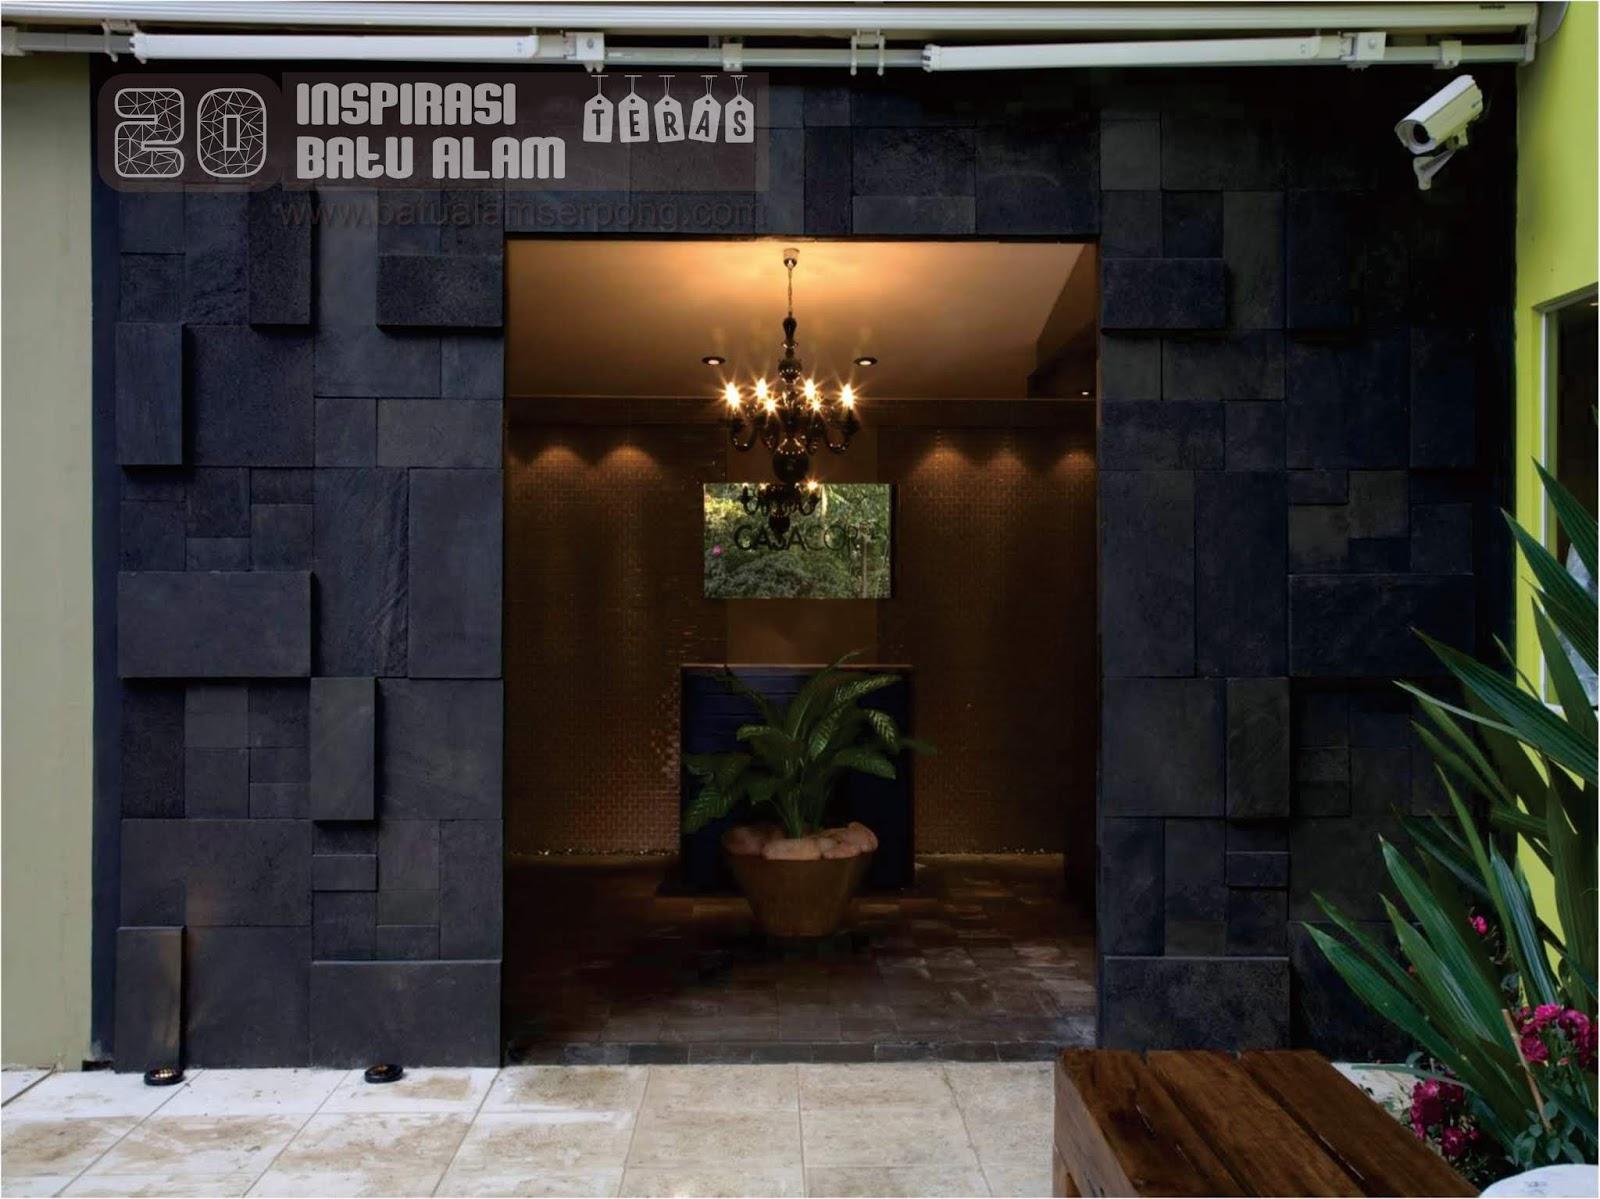 8300 Koleksi Gambar Rumah Dengan Hiasan Batu Alam Terbaik